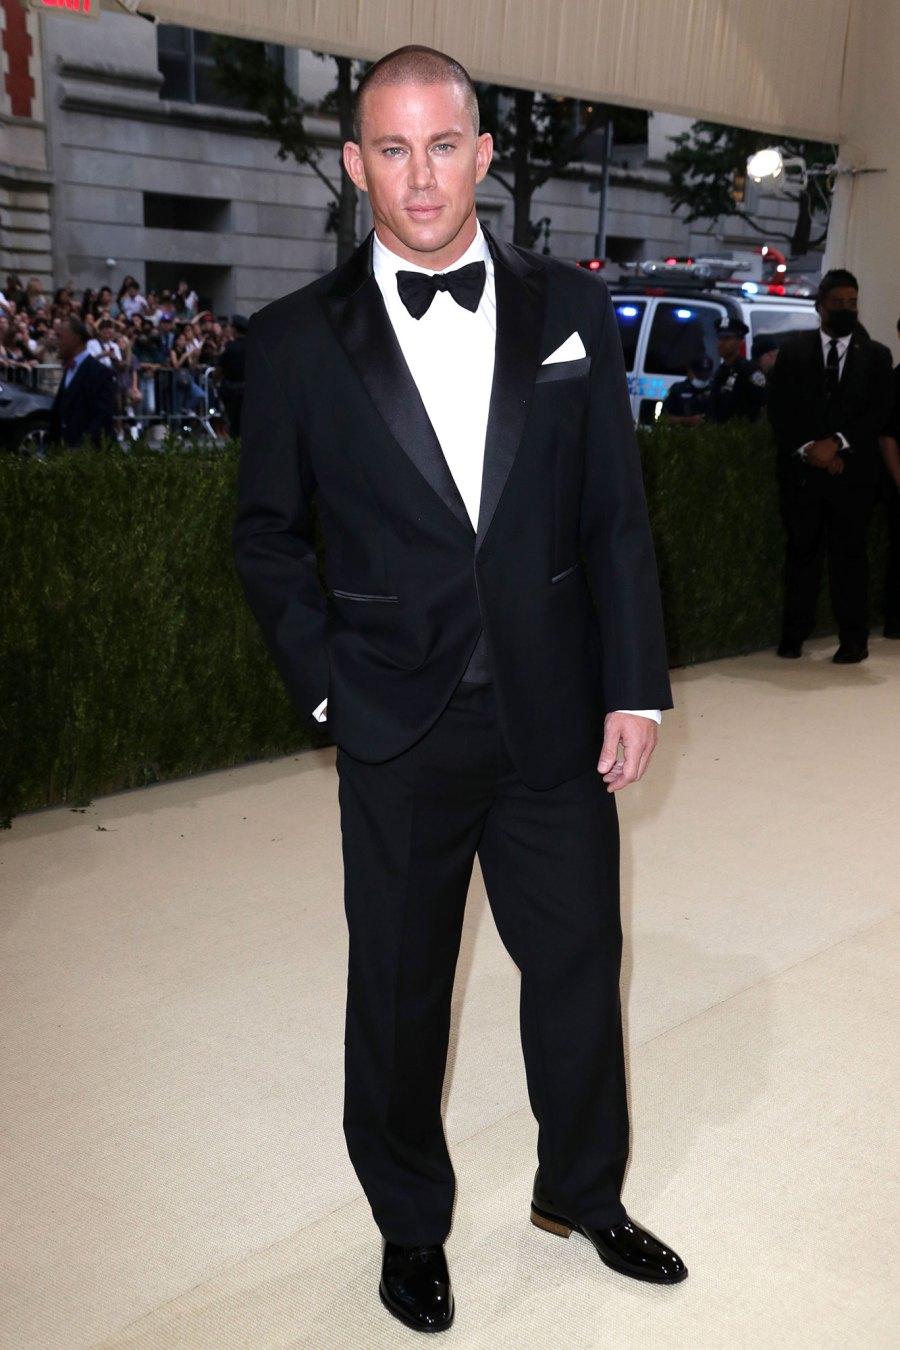 Channing Tatum and Zoe Kravitz Leave Met Gala Together After Walking Red Carpet Separately 2021 Met Gala 05